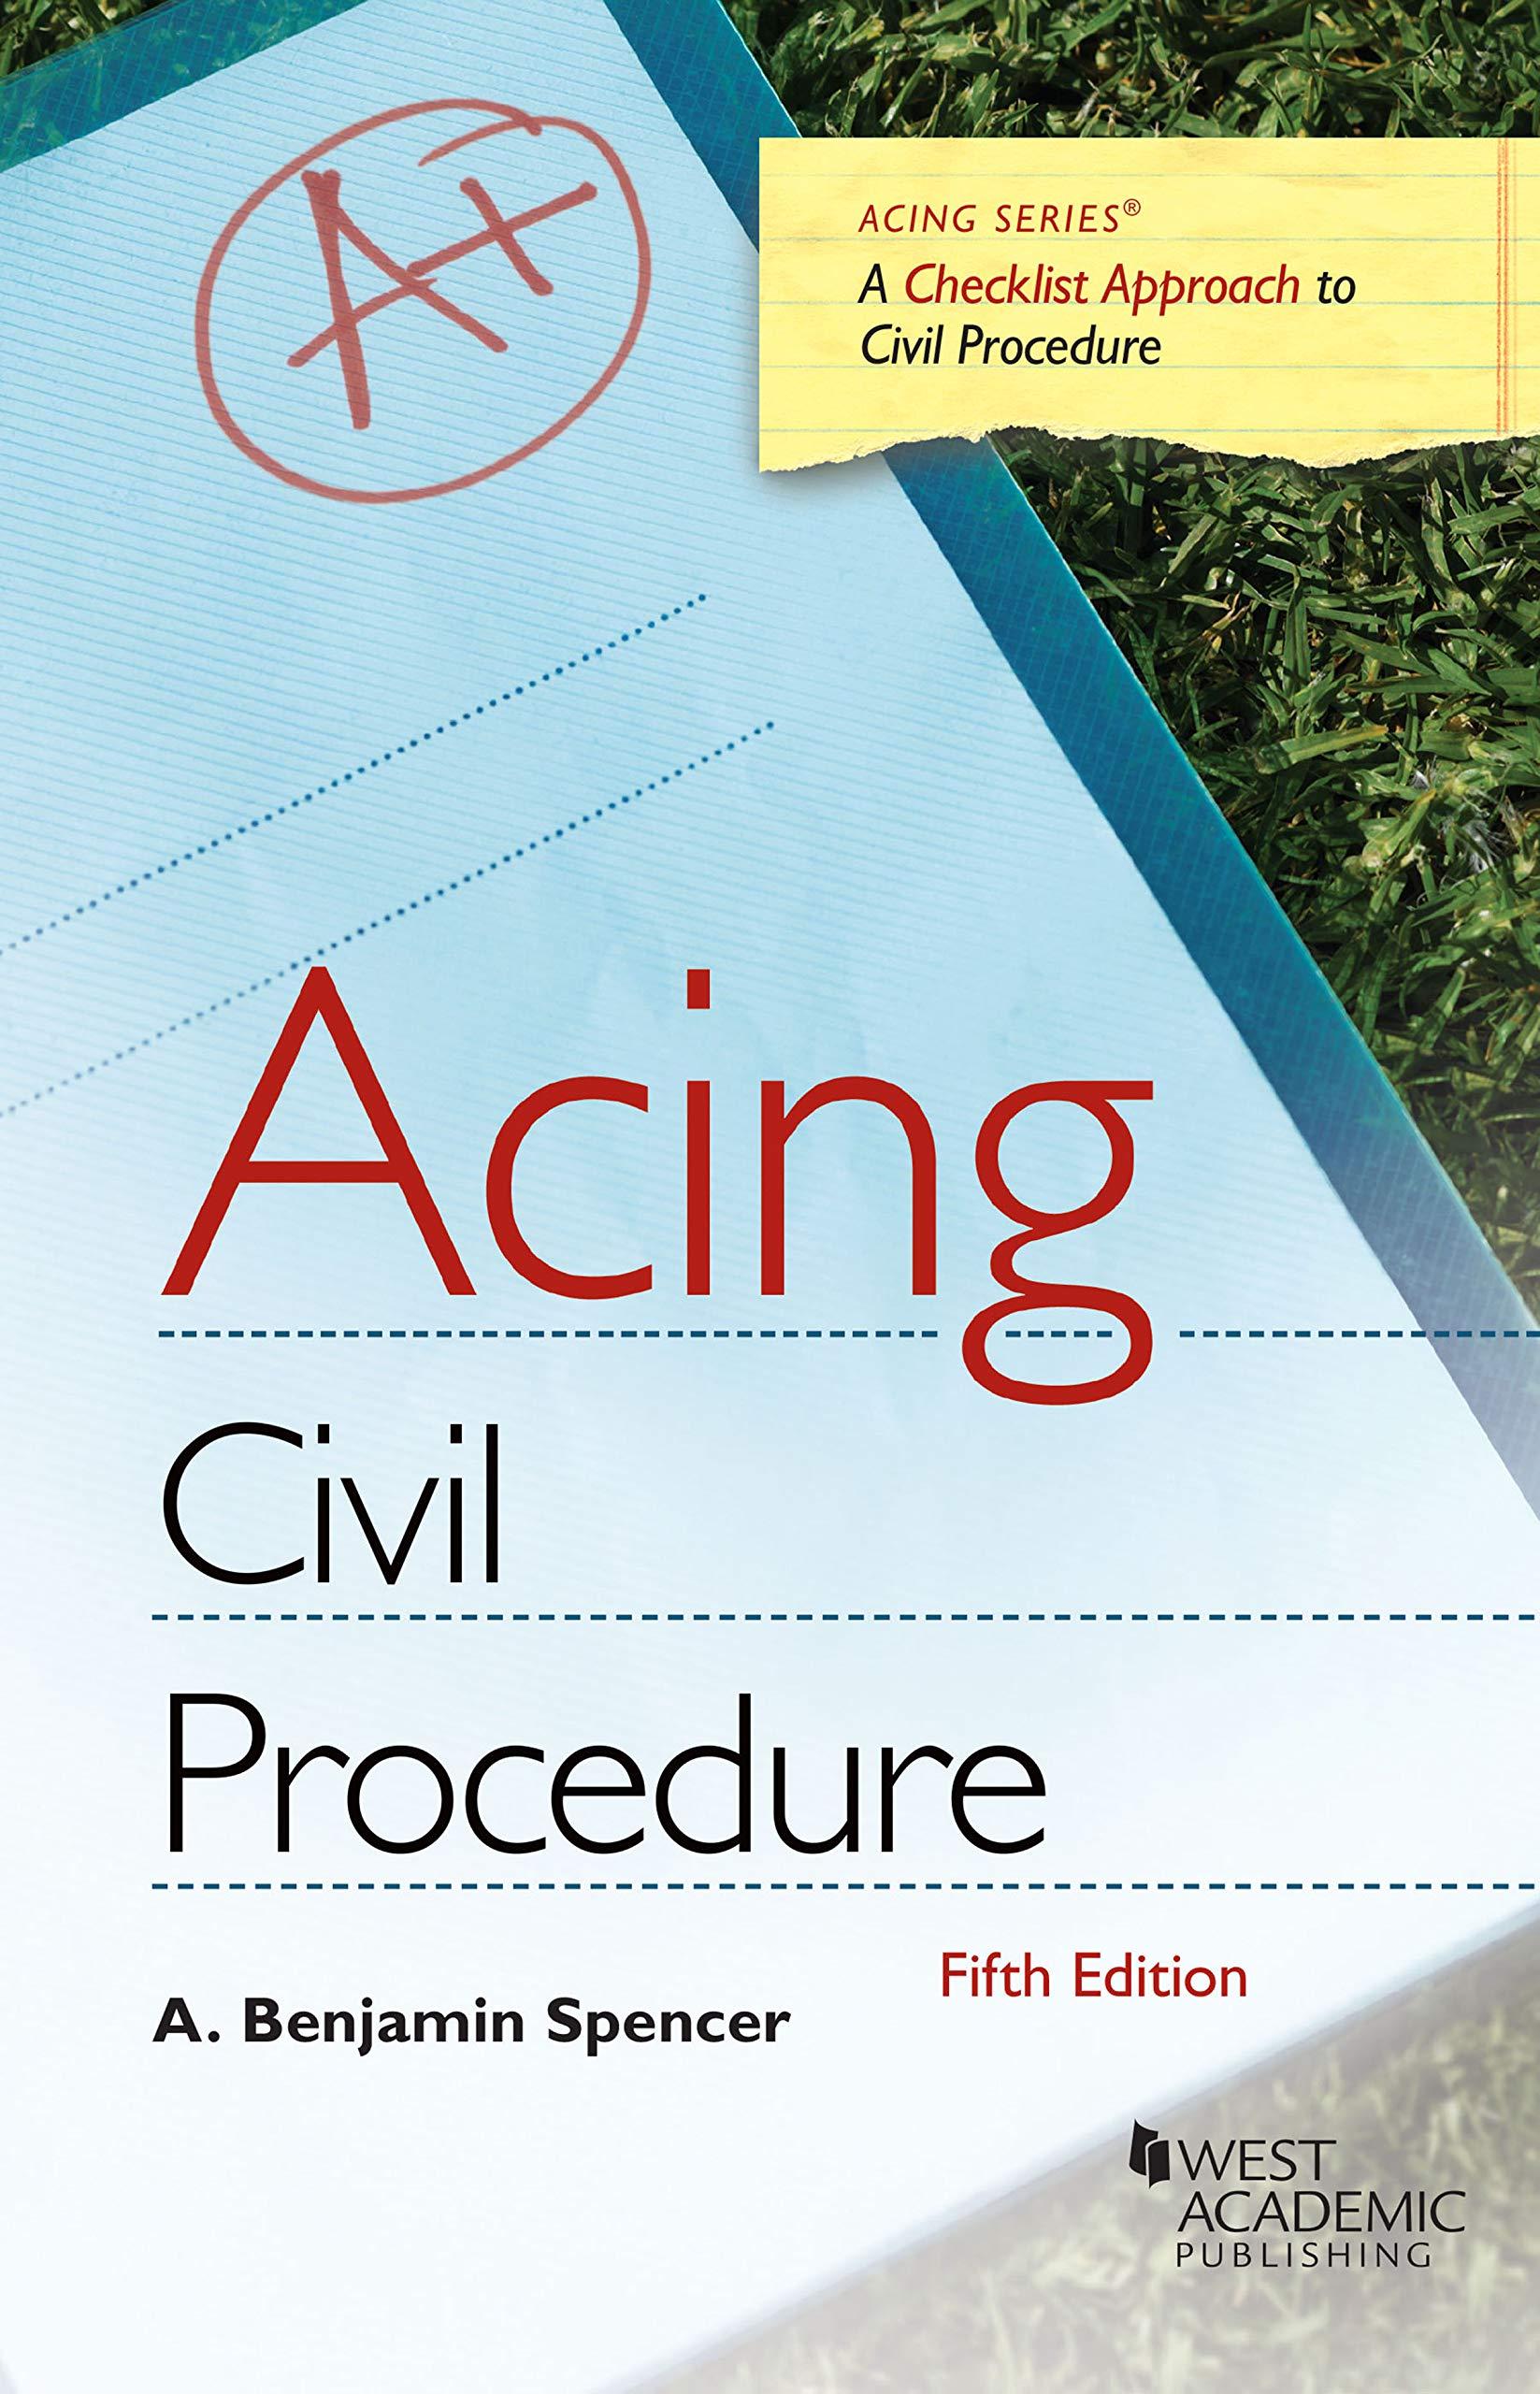 Acing Civil Procedure (Acing Series) by West Academic Publishing